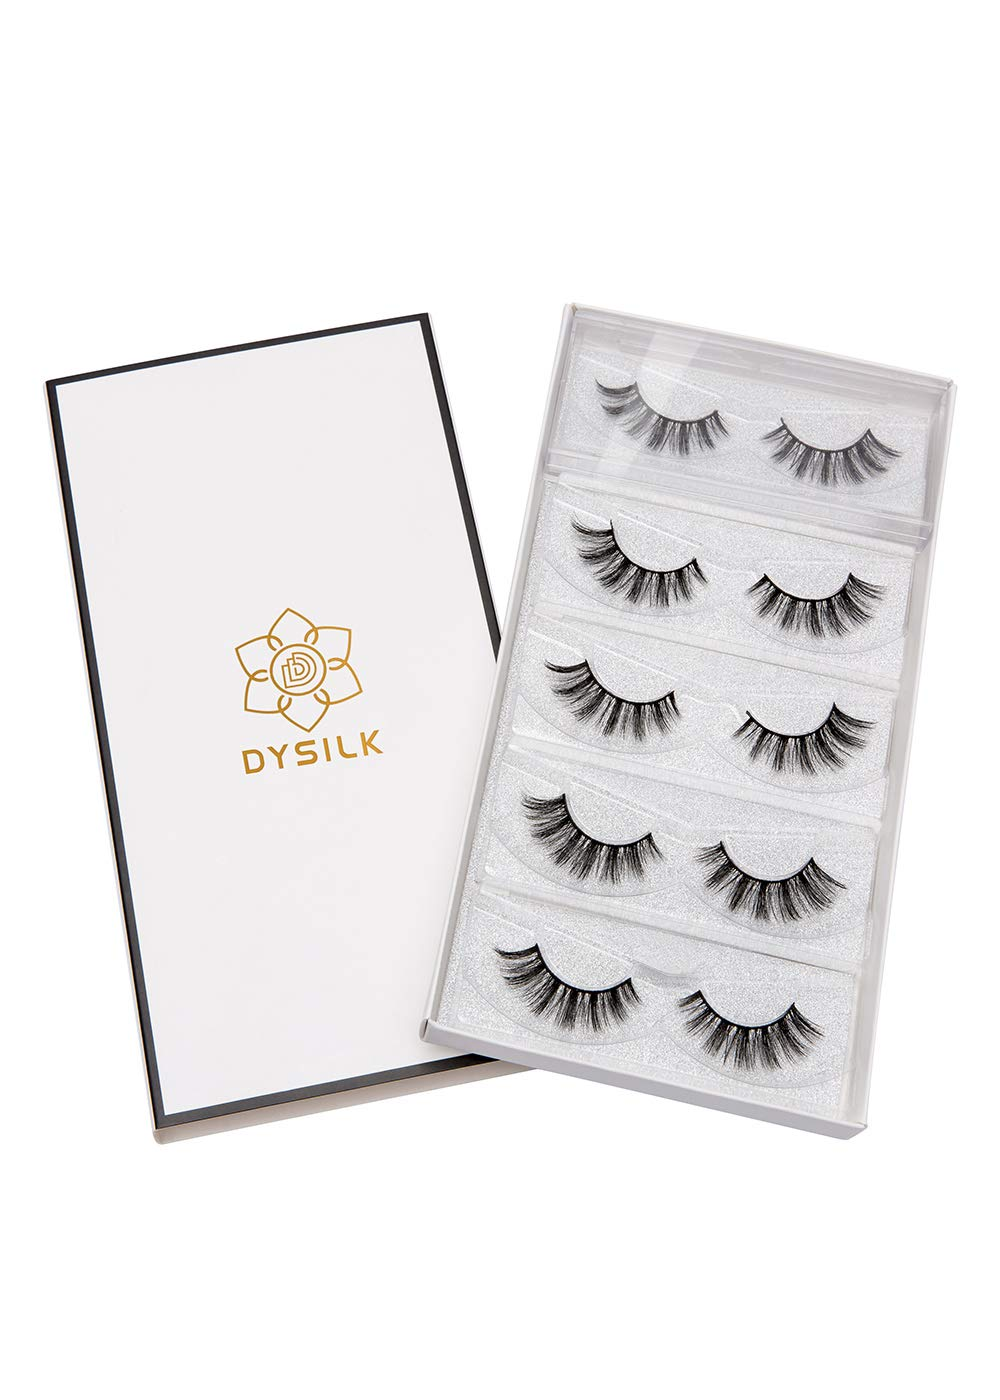 DYSILK 3D Eyelashes Mink Natural Look False Eyelashes Extension Makeup Long Handmade Fake Eyelashes Fluffy Soft Reusable Black 5 Pairs